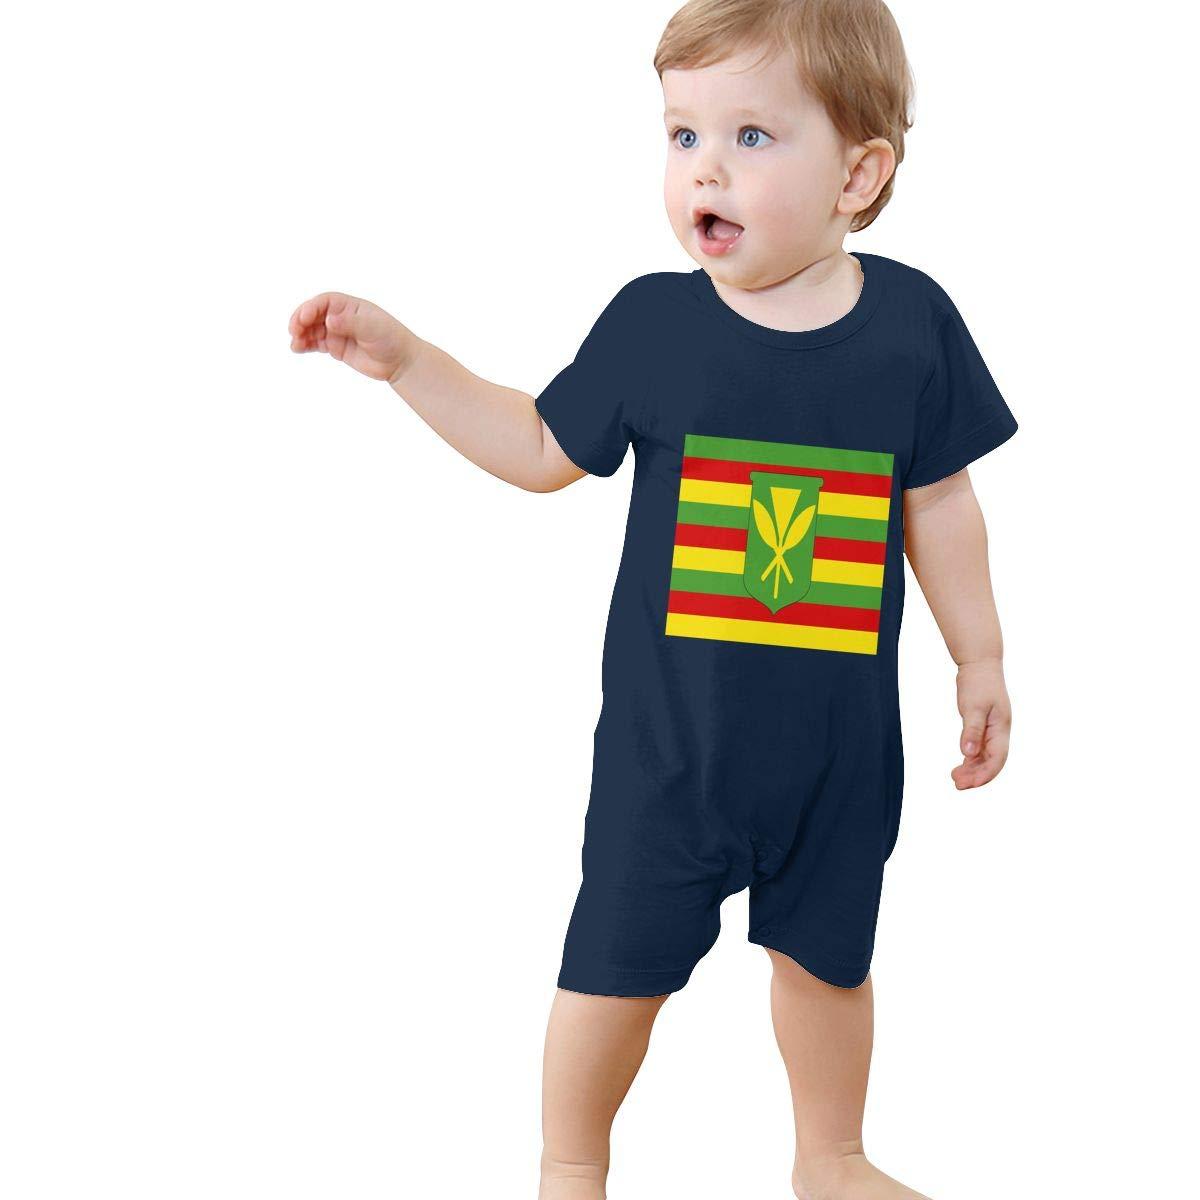 Baby Infant Toddler Bodysuits The Original Hawaii Flag Cotton Short Sleeve Jumpsuit